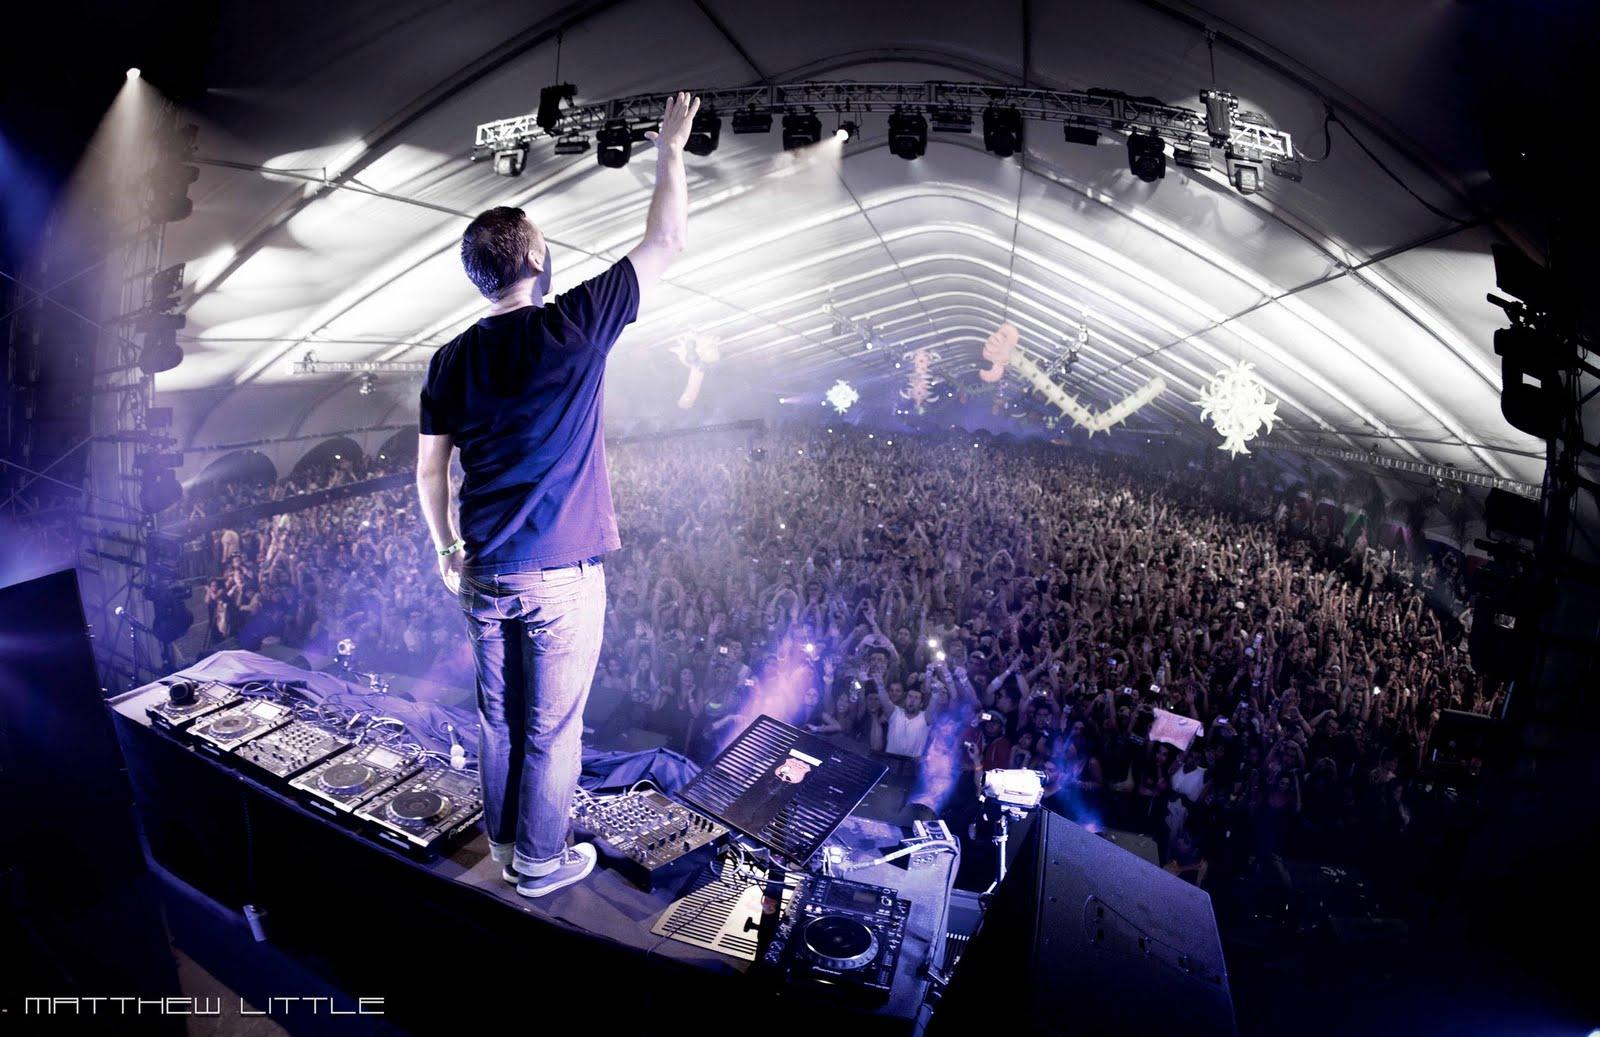 http://3.bp.blogspot.com/-po17Sr09RCw/Te5ifRjzX7I/AAAAAAAAAkM/yiYtYeNYElE/s1600/Kaskade-%2540-huge-crowd.jpg